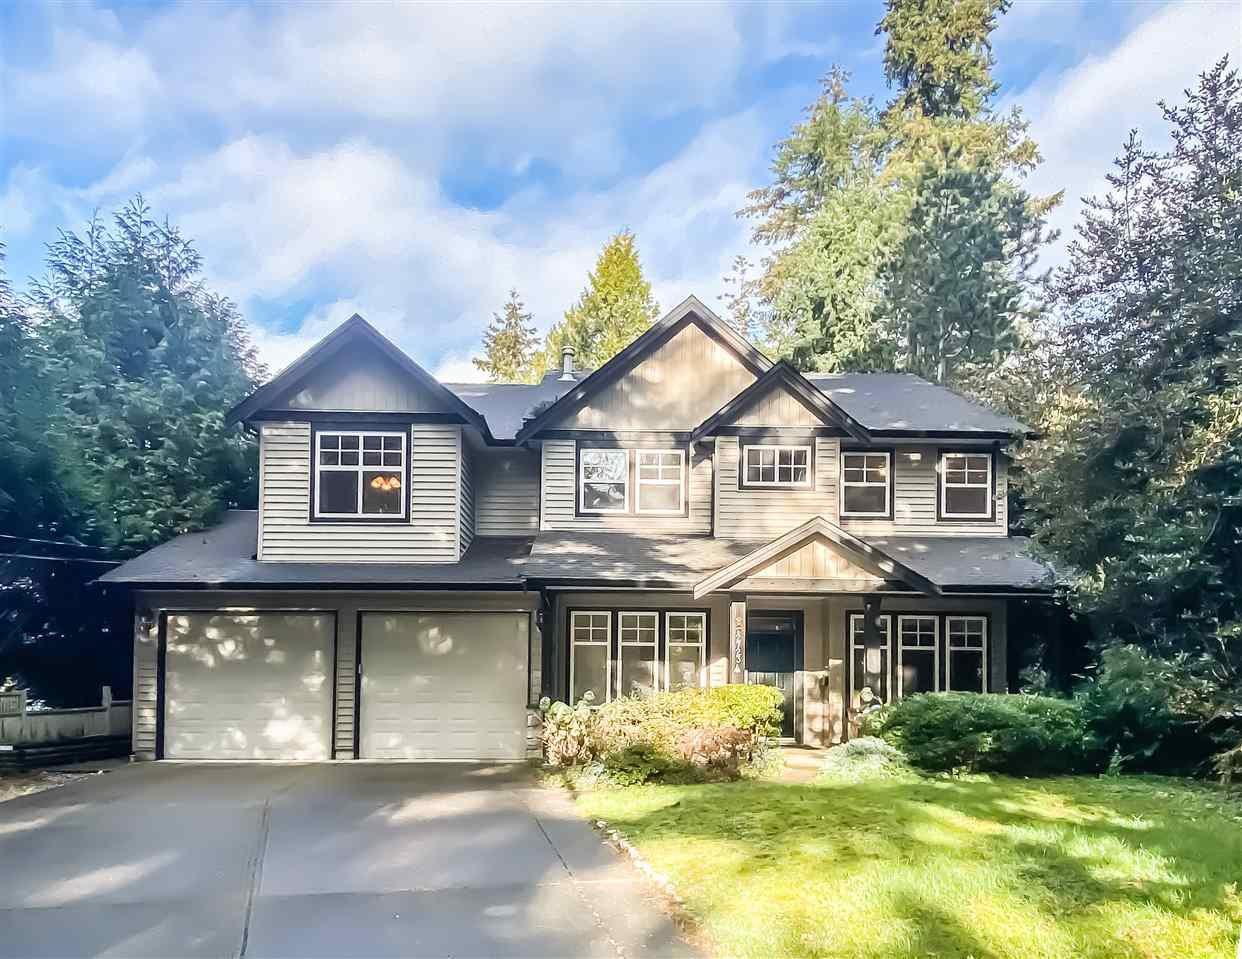 Main Photo: 12723 16 AVENUE in Surrey: Crescent Bch Ocean Pk. House for sale (South Surrey White Rock)  : MLS®# R2519619